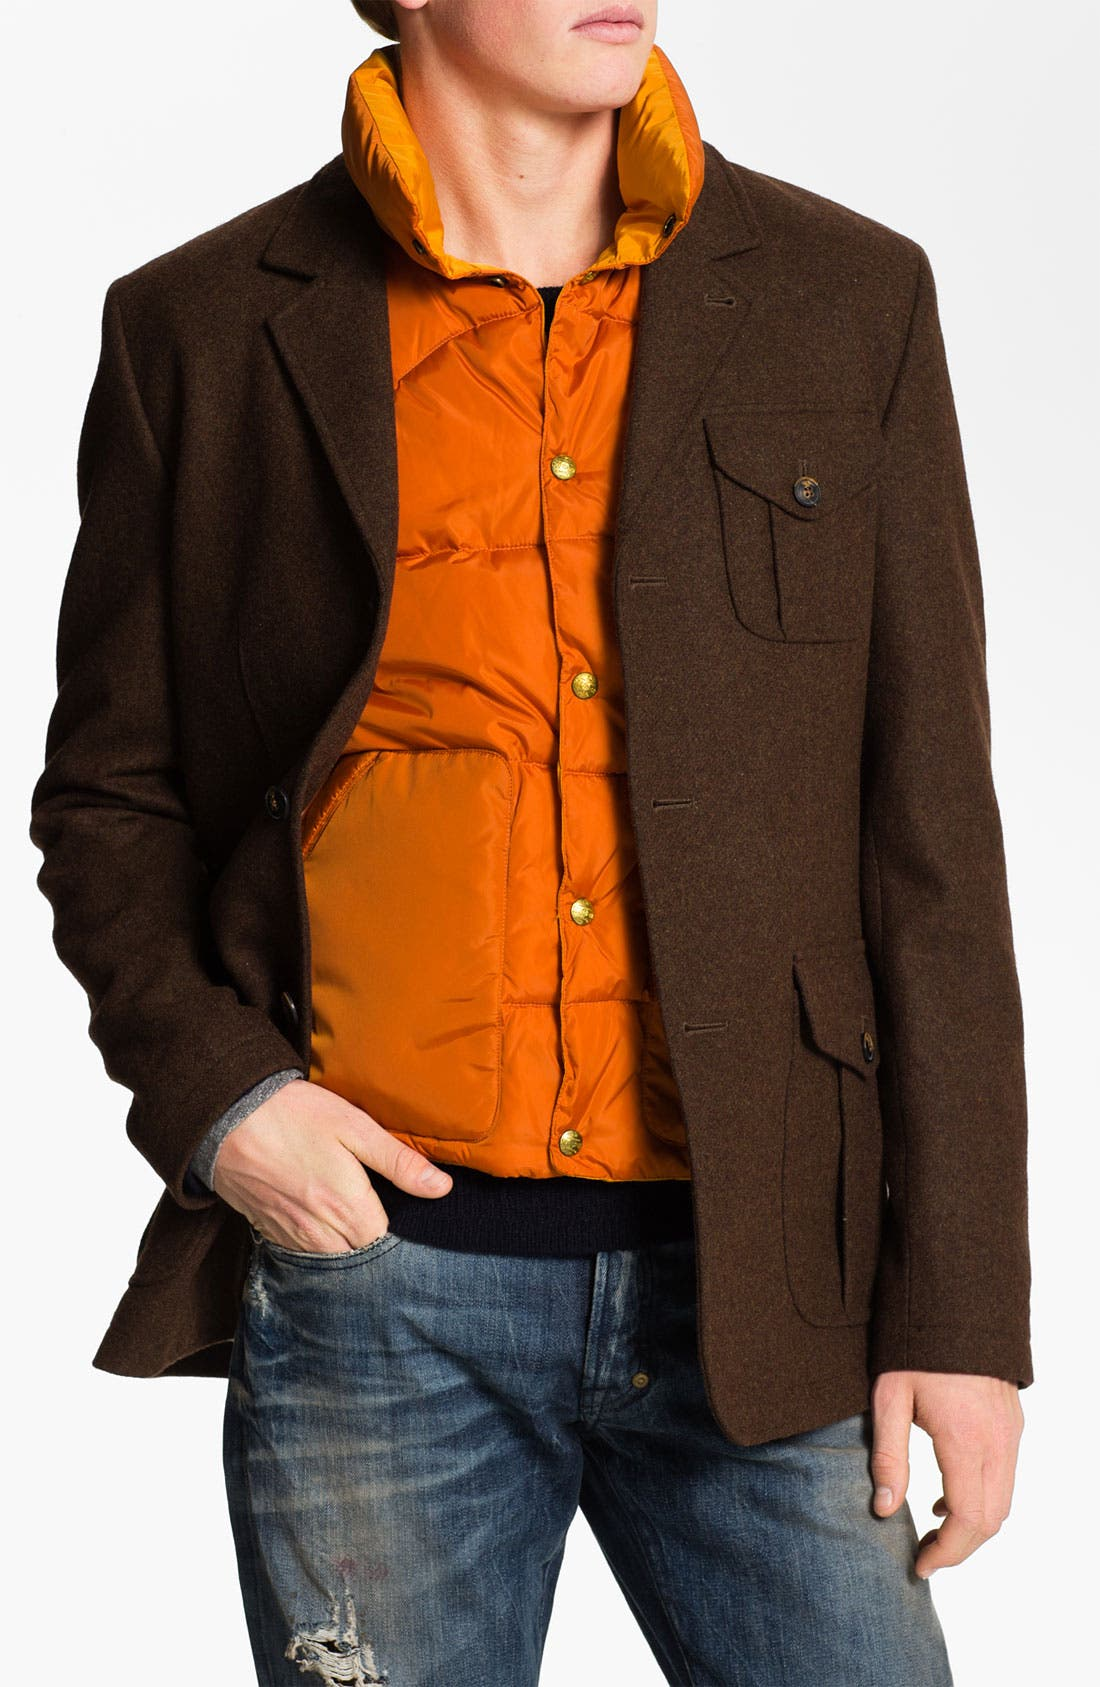 Alternate Image 1 Selected - Scotch & Soda Hunting Blazer with Removable Vest